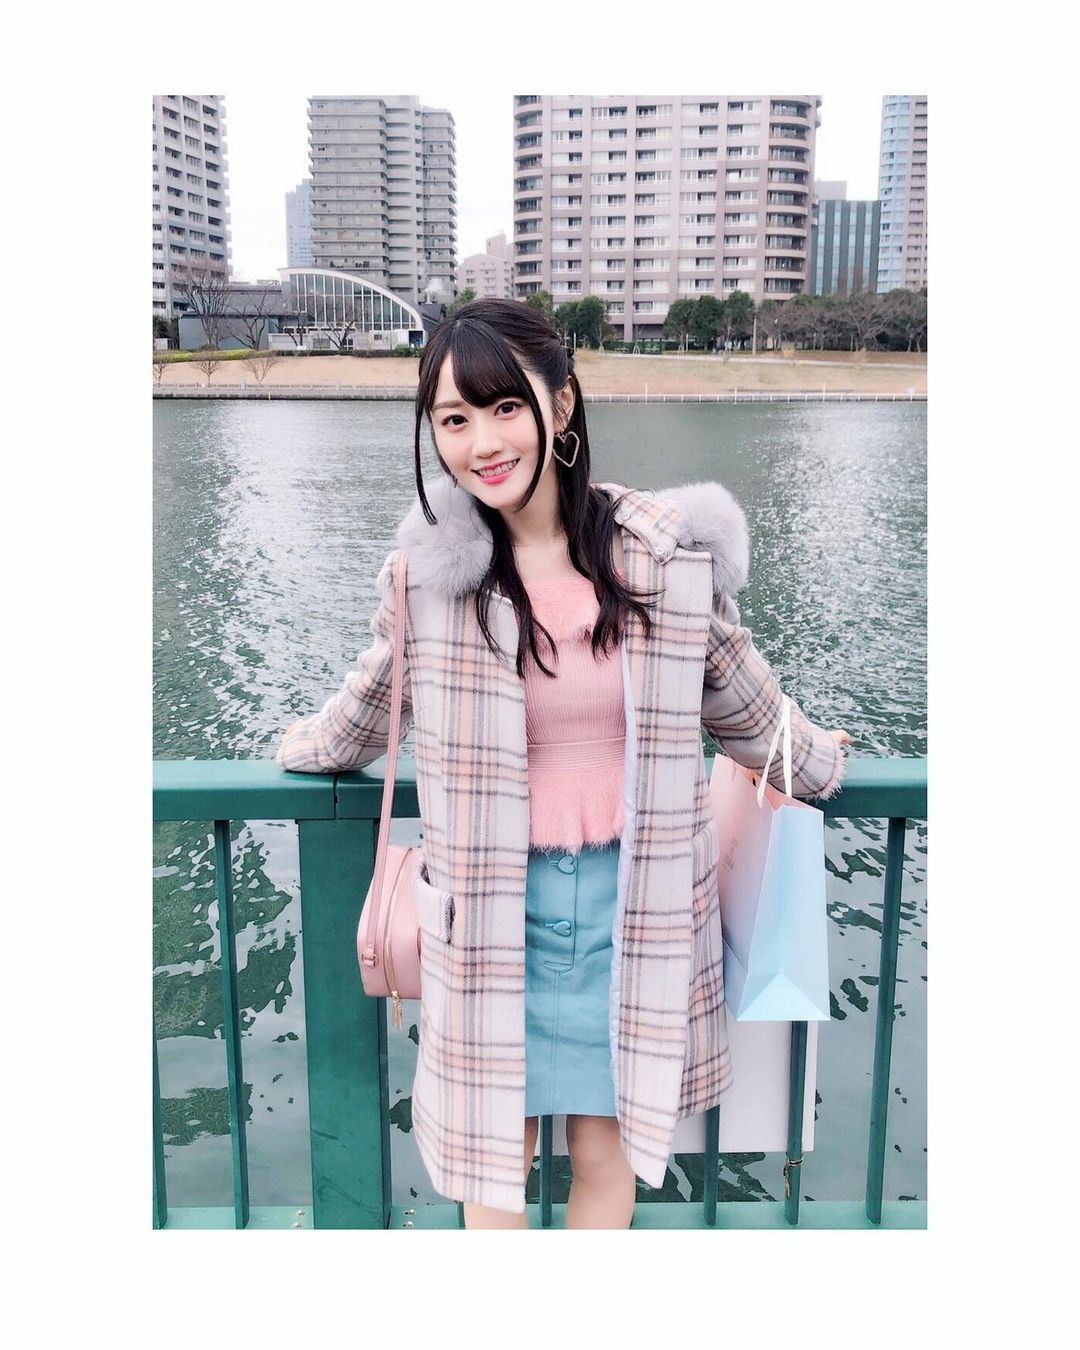 ogura_yui185.jpg